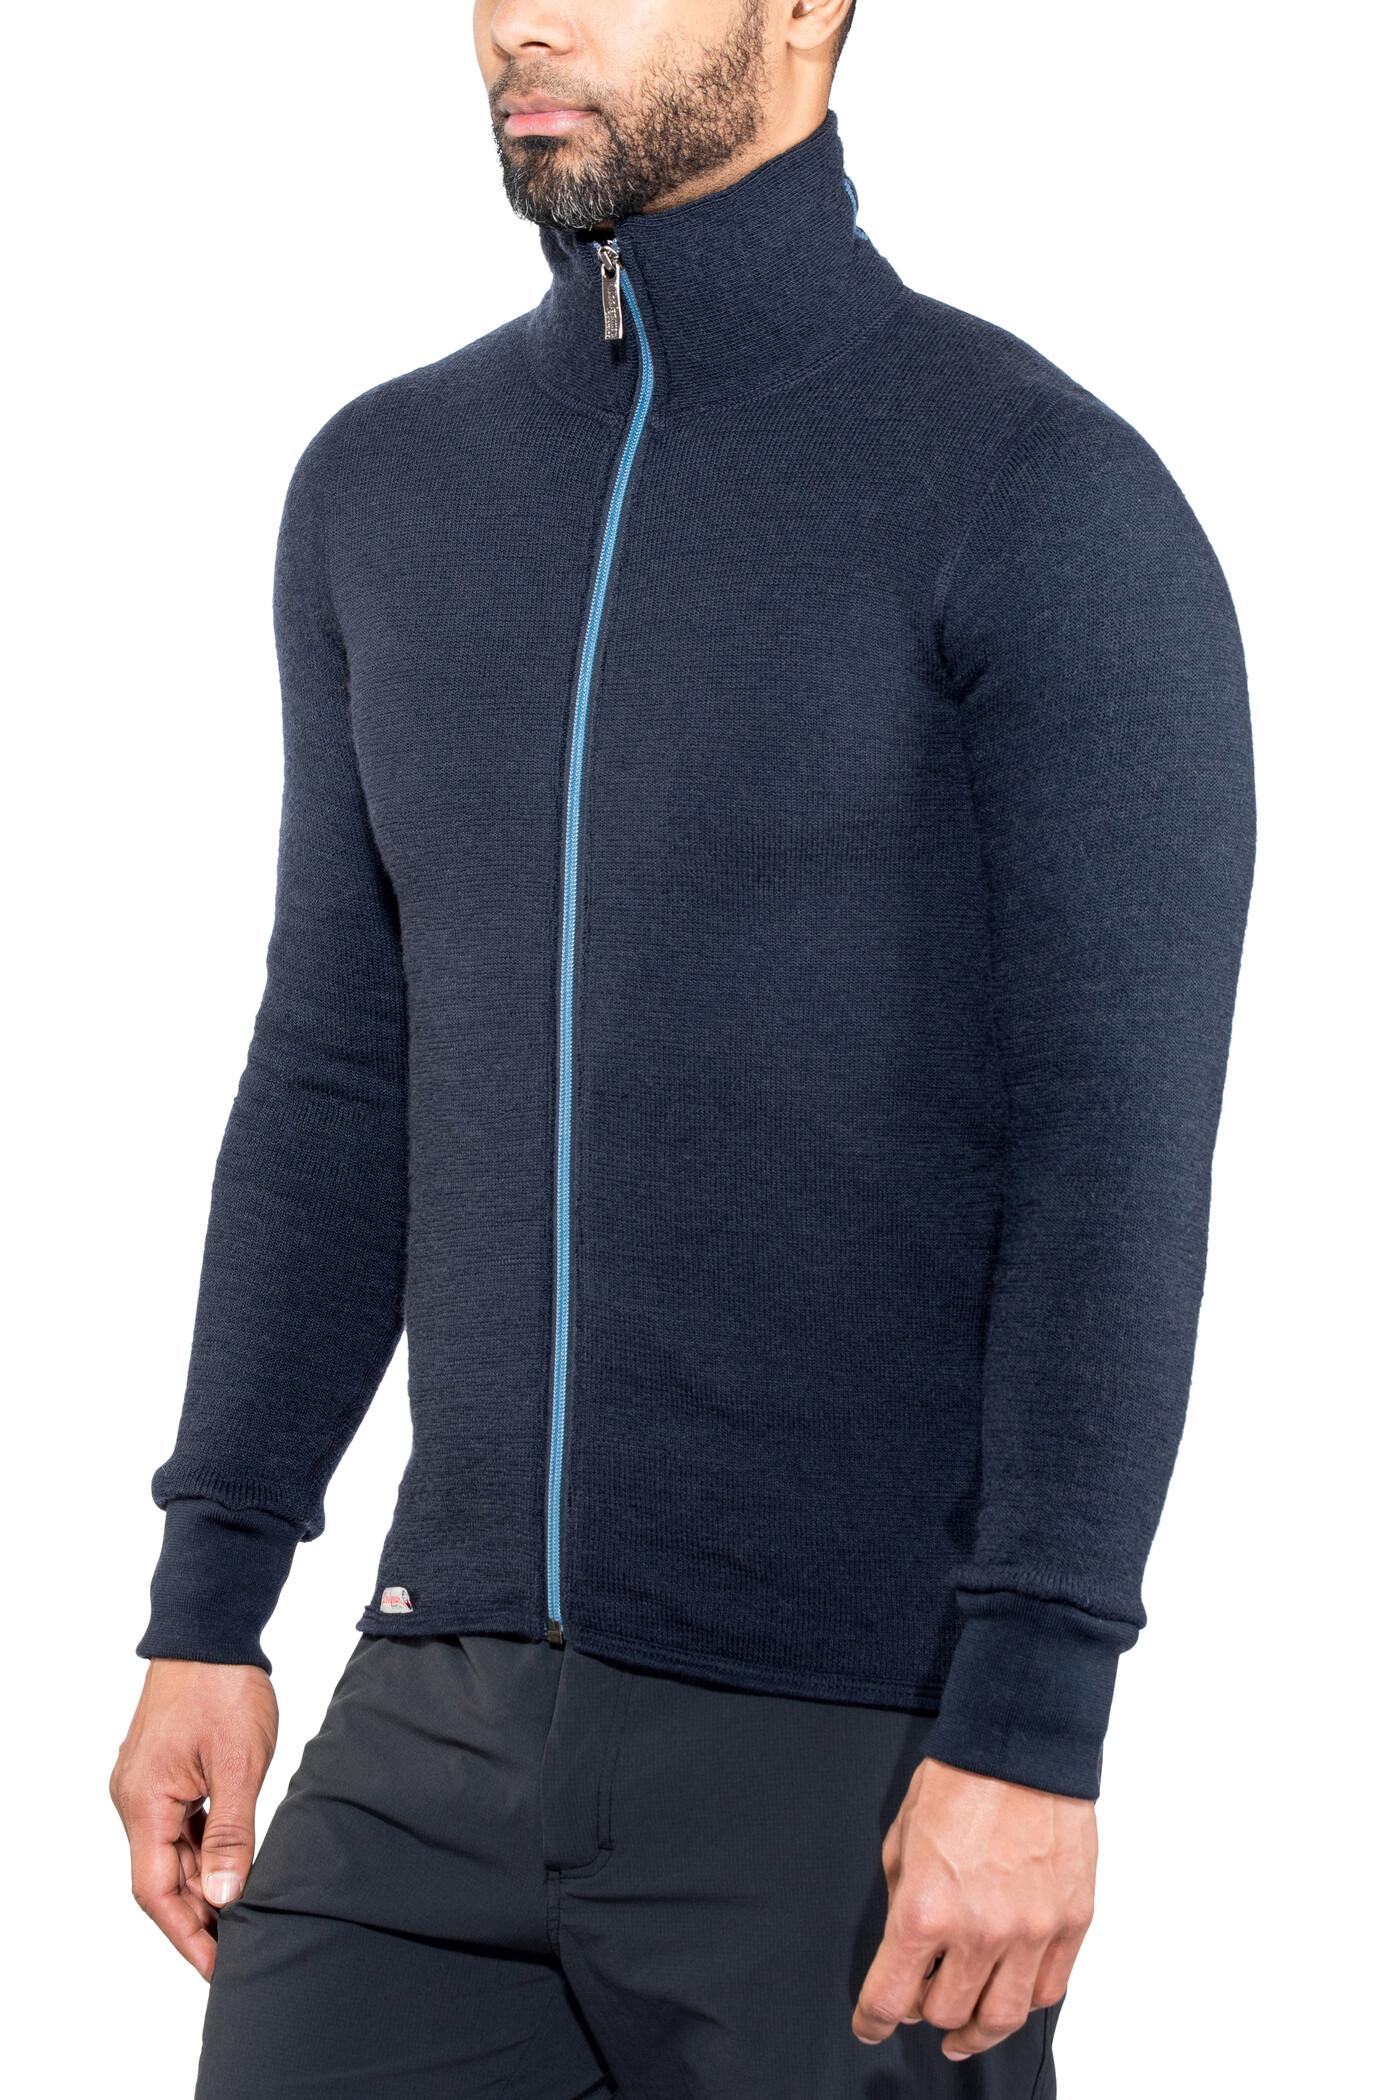 Woolpower 400 Full Zip Jacket Colour Collection dark navynordic blue